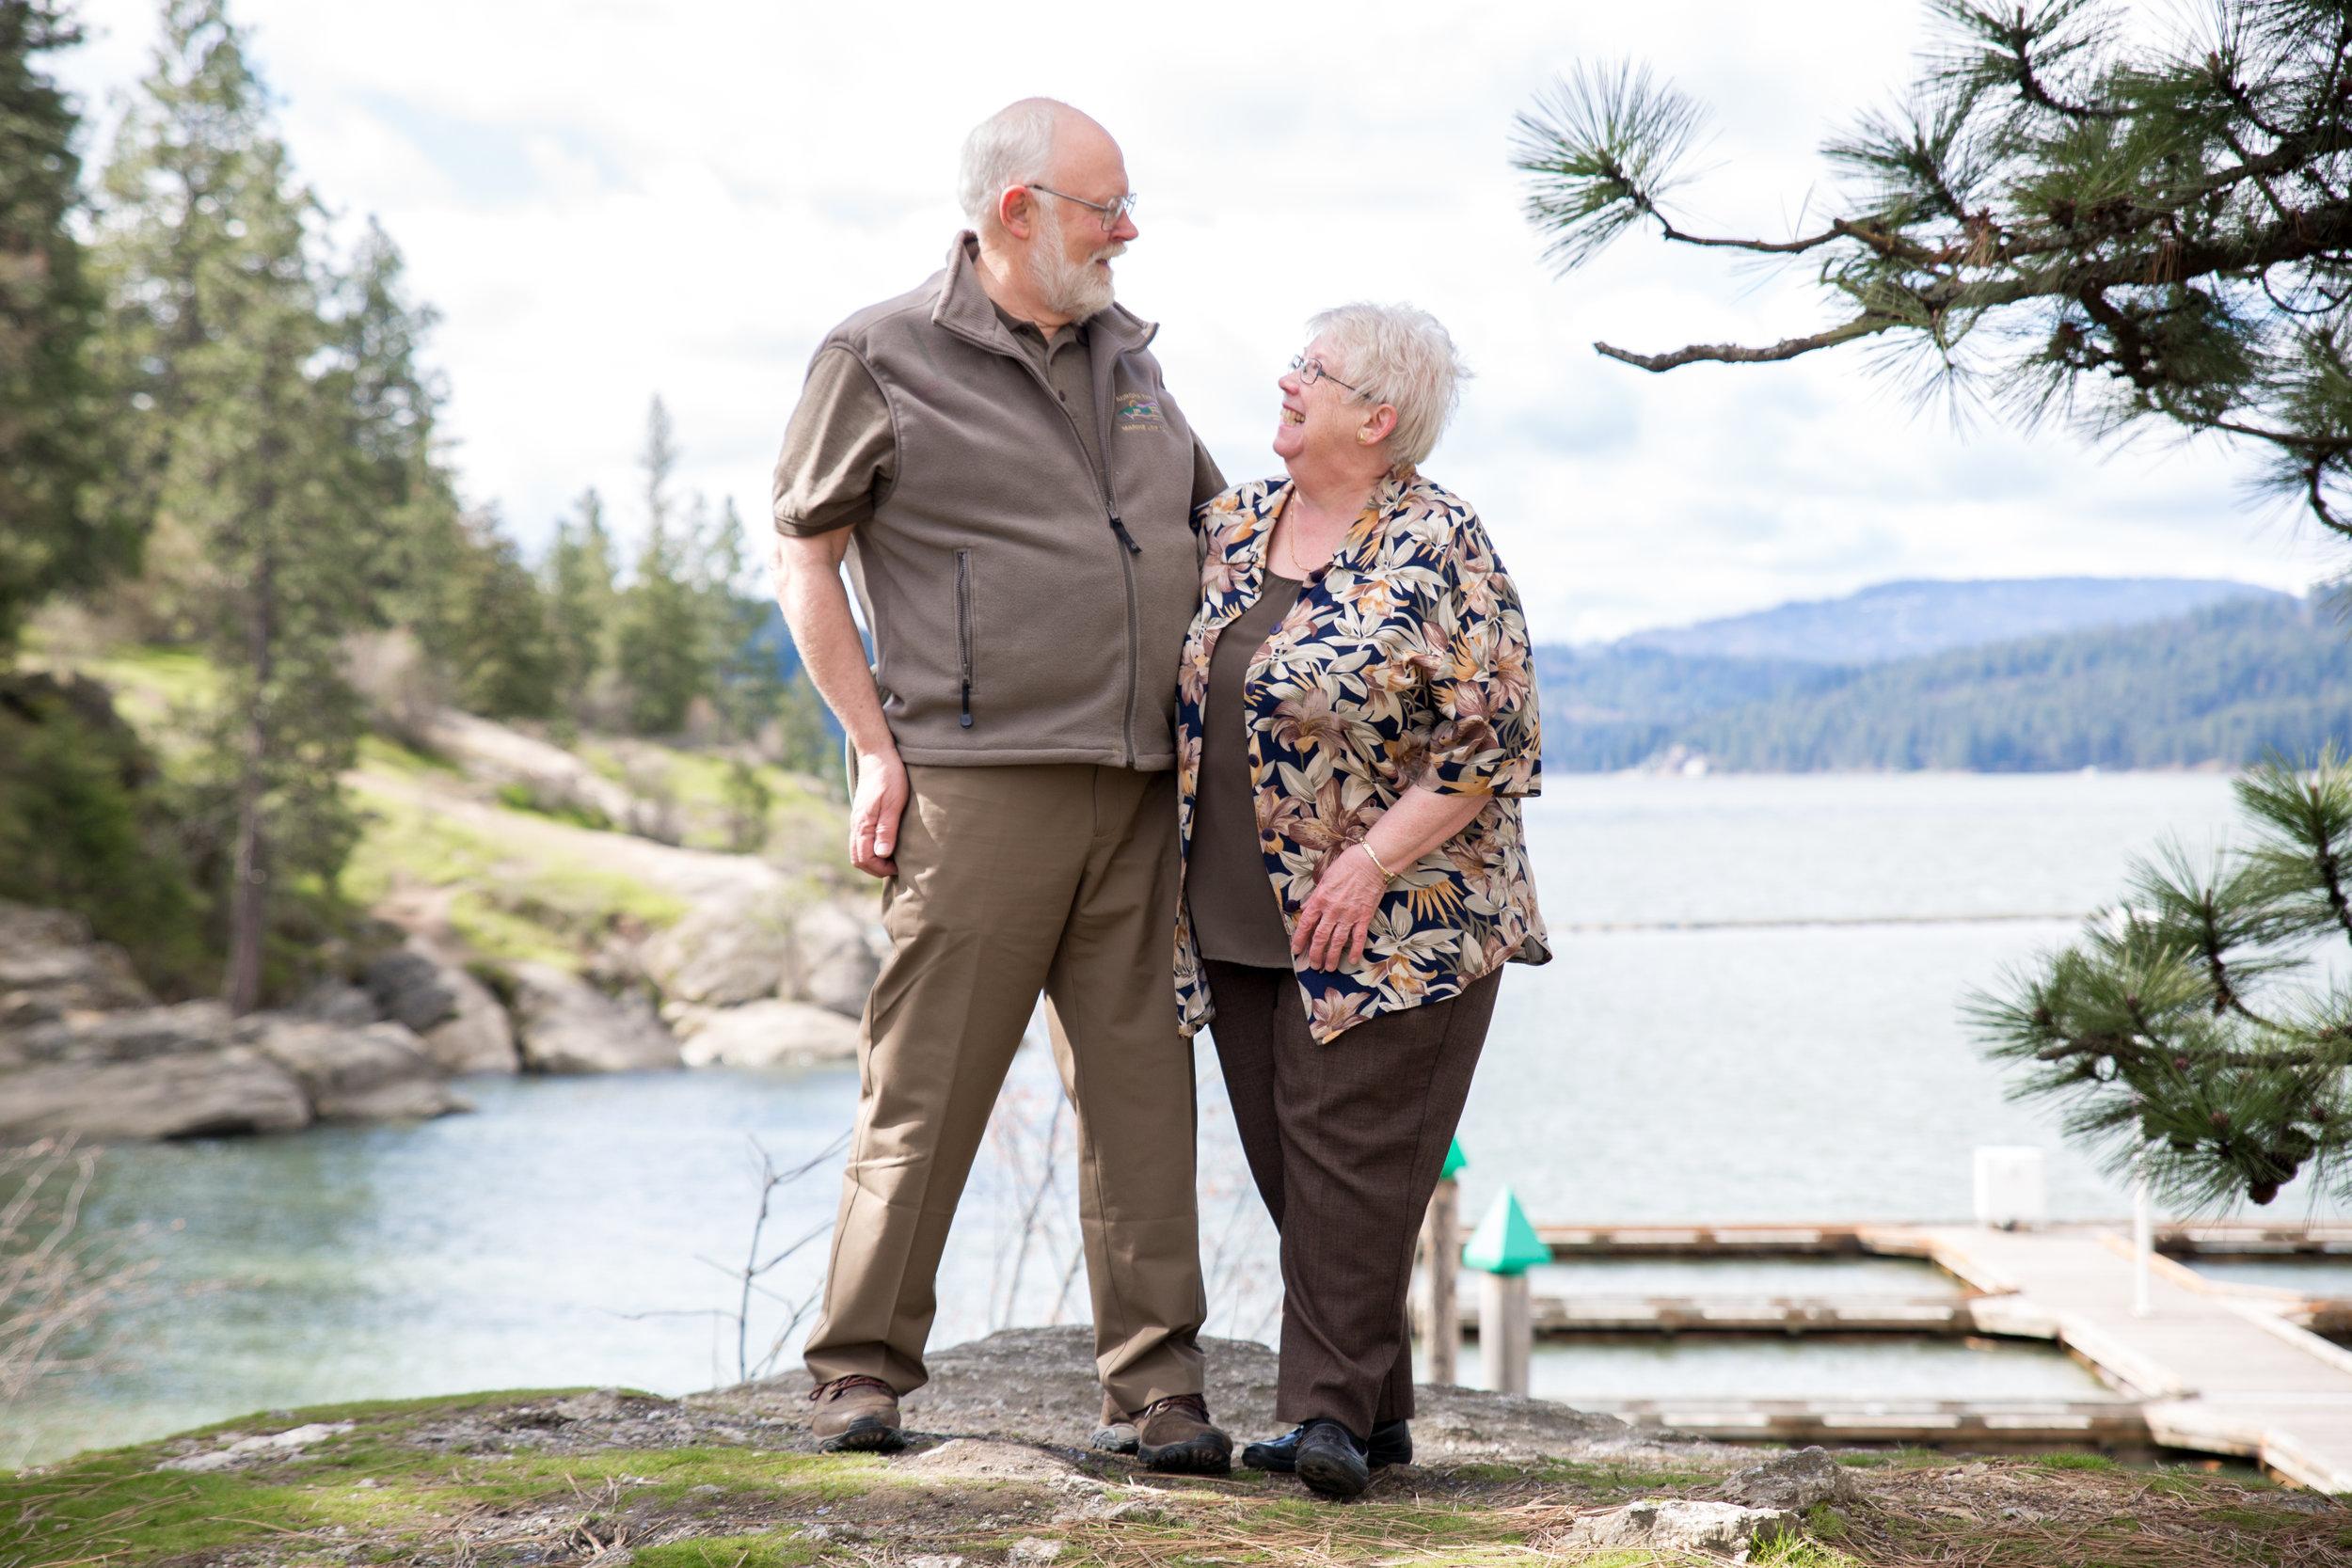 Grandma grandpa smile at shoot in Coeur d' Alene Idaho